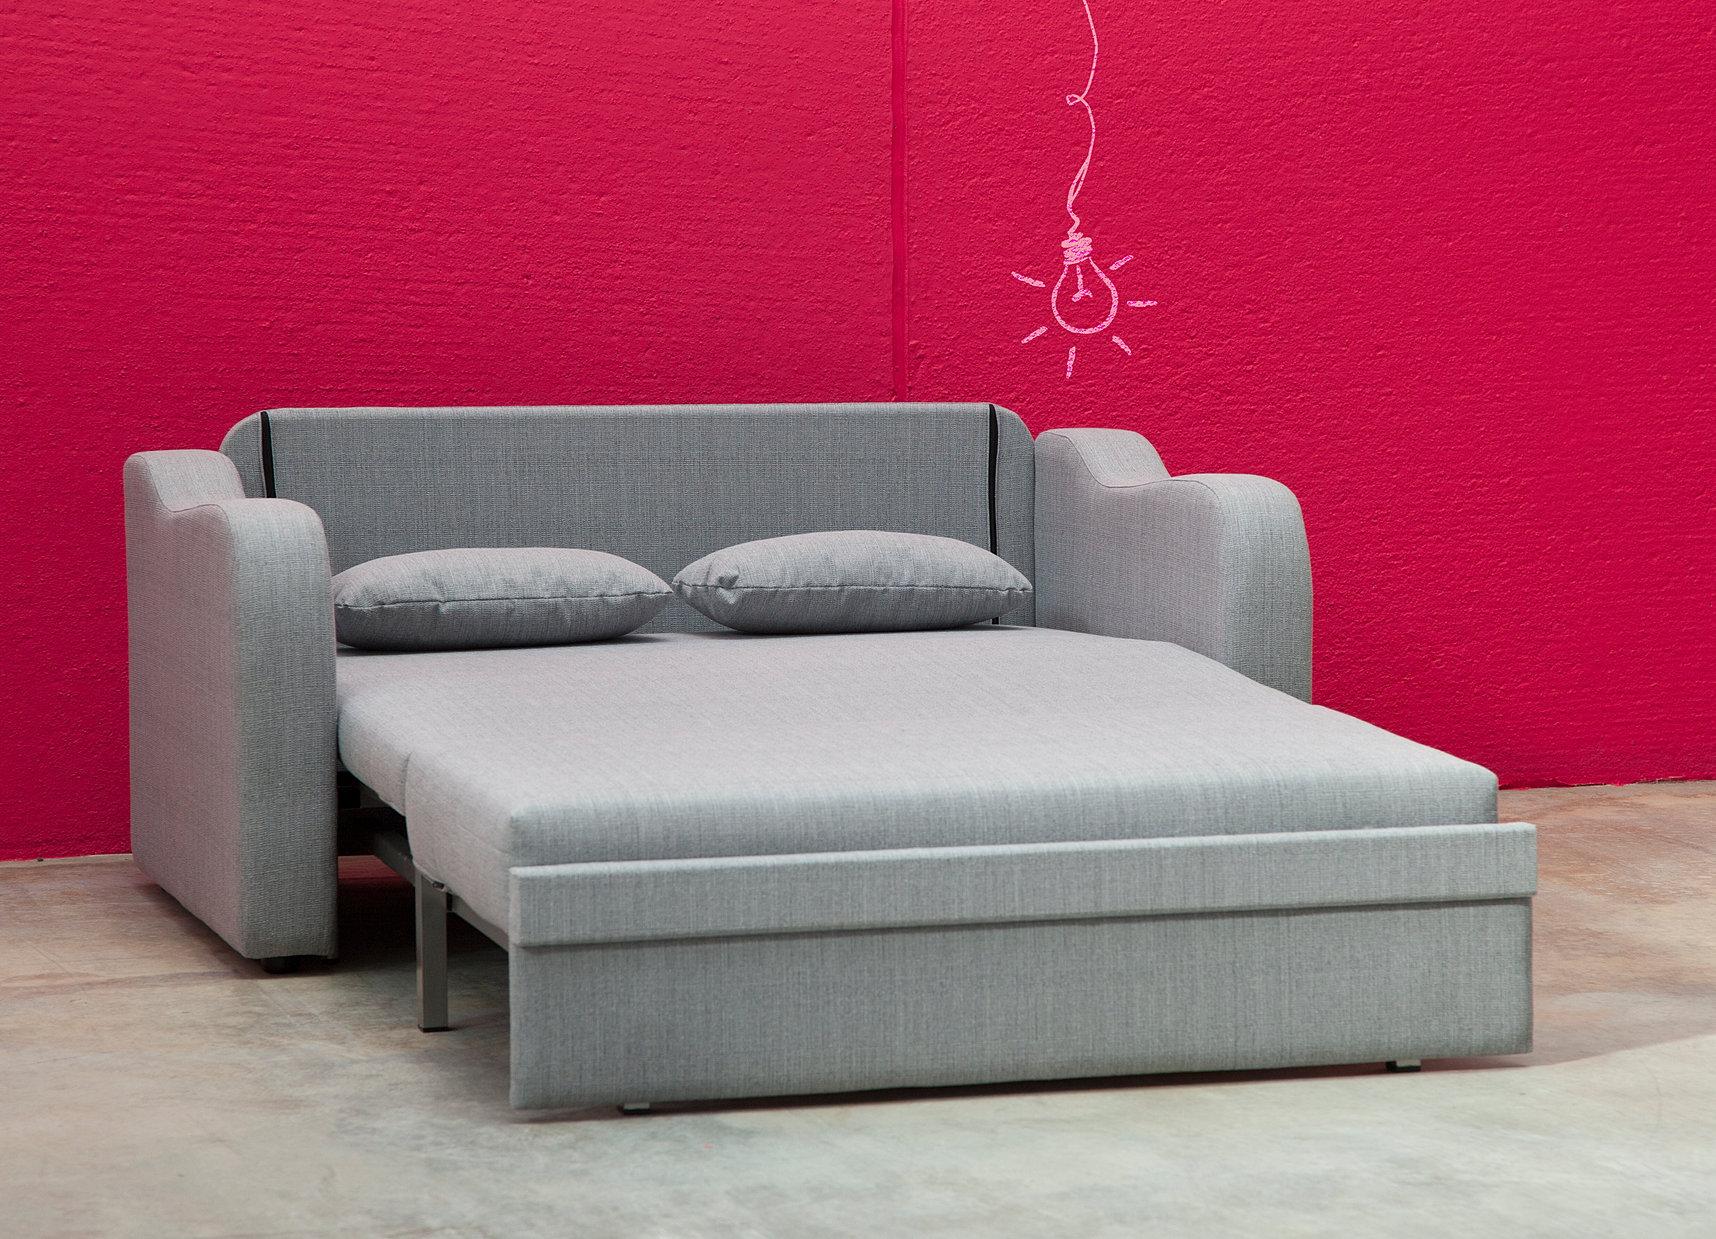 Sofass higuera la real sof s cama en higuera la real - Muebles higuera la real ...